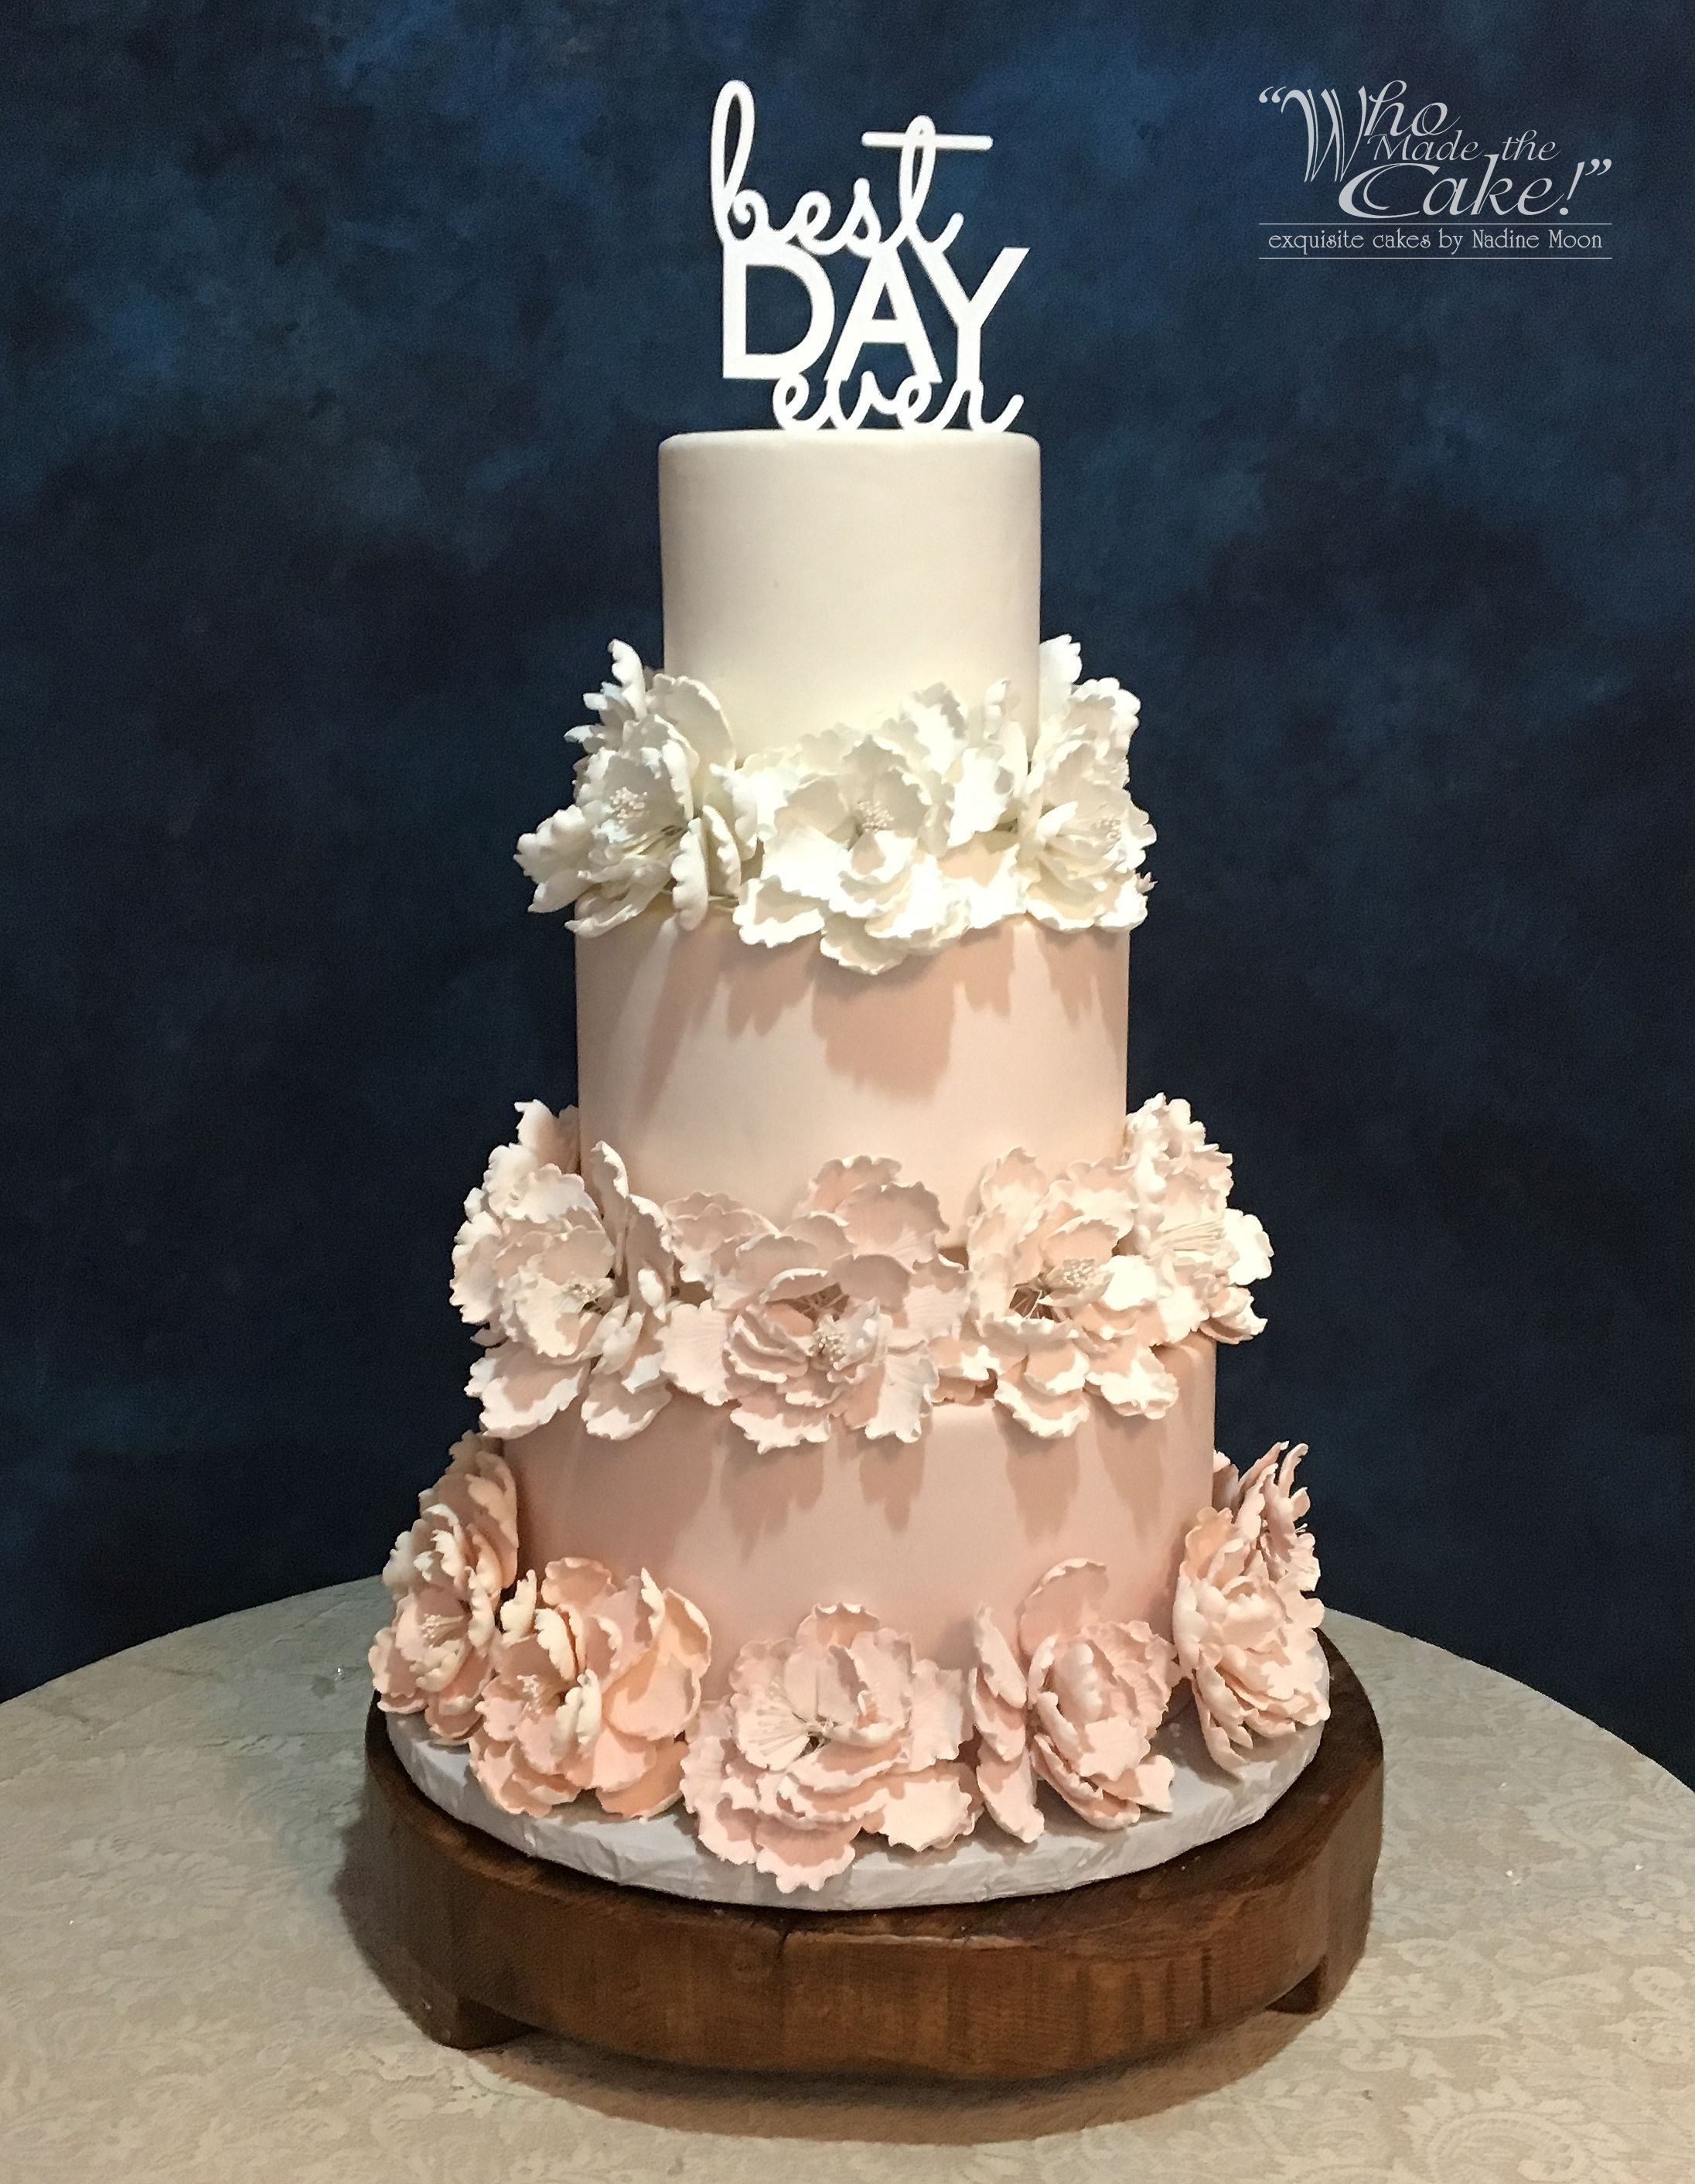 This ombre blush wedding cakeus elegant simplicity makes it